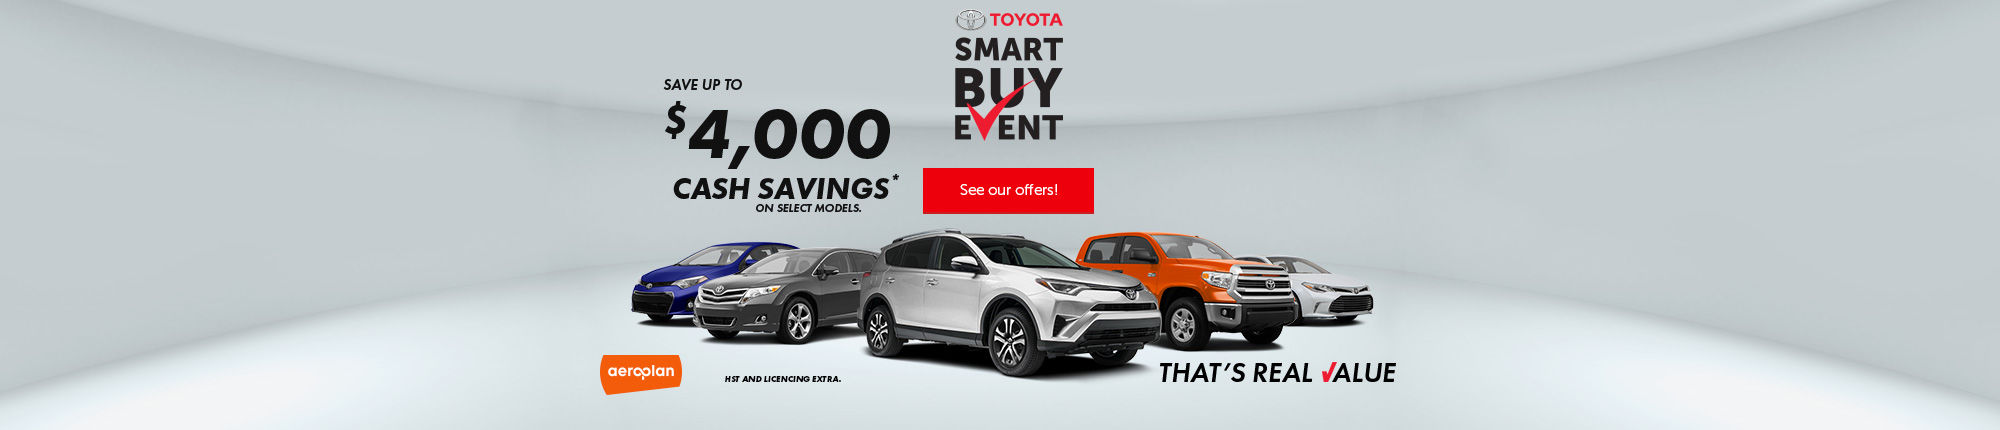 Promotions Laking Toyota February